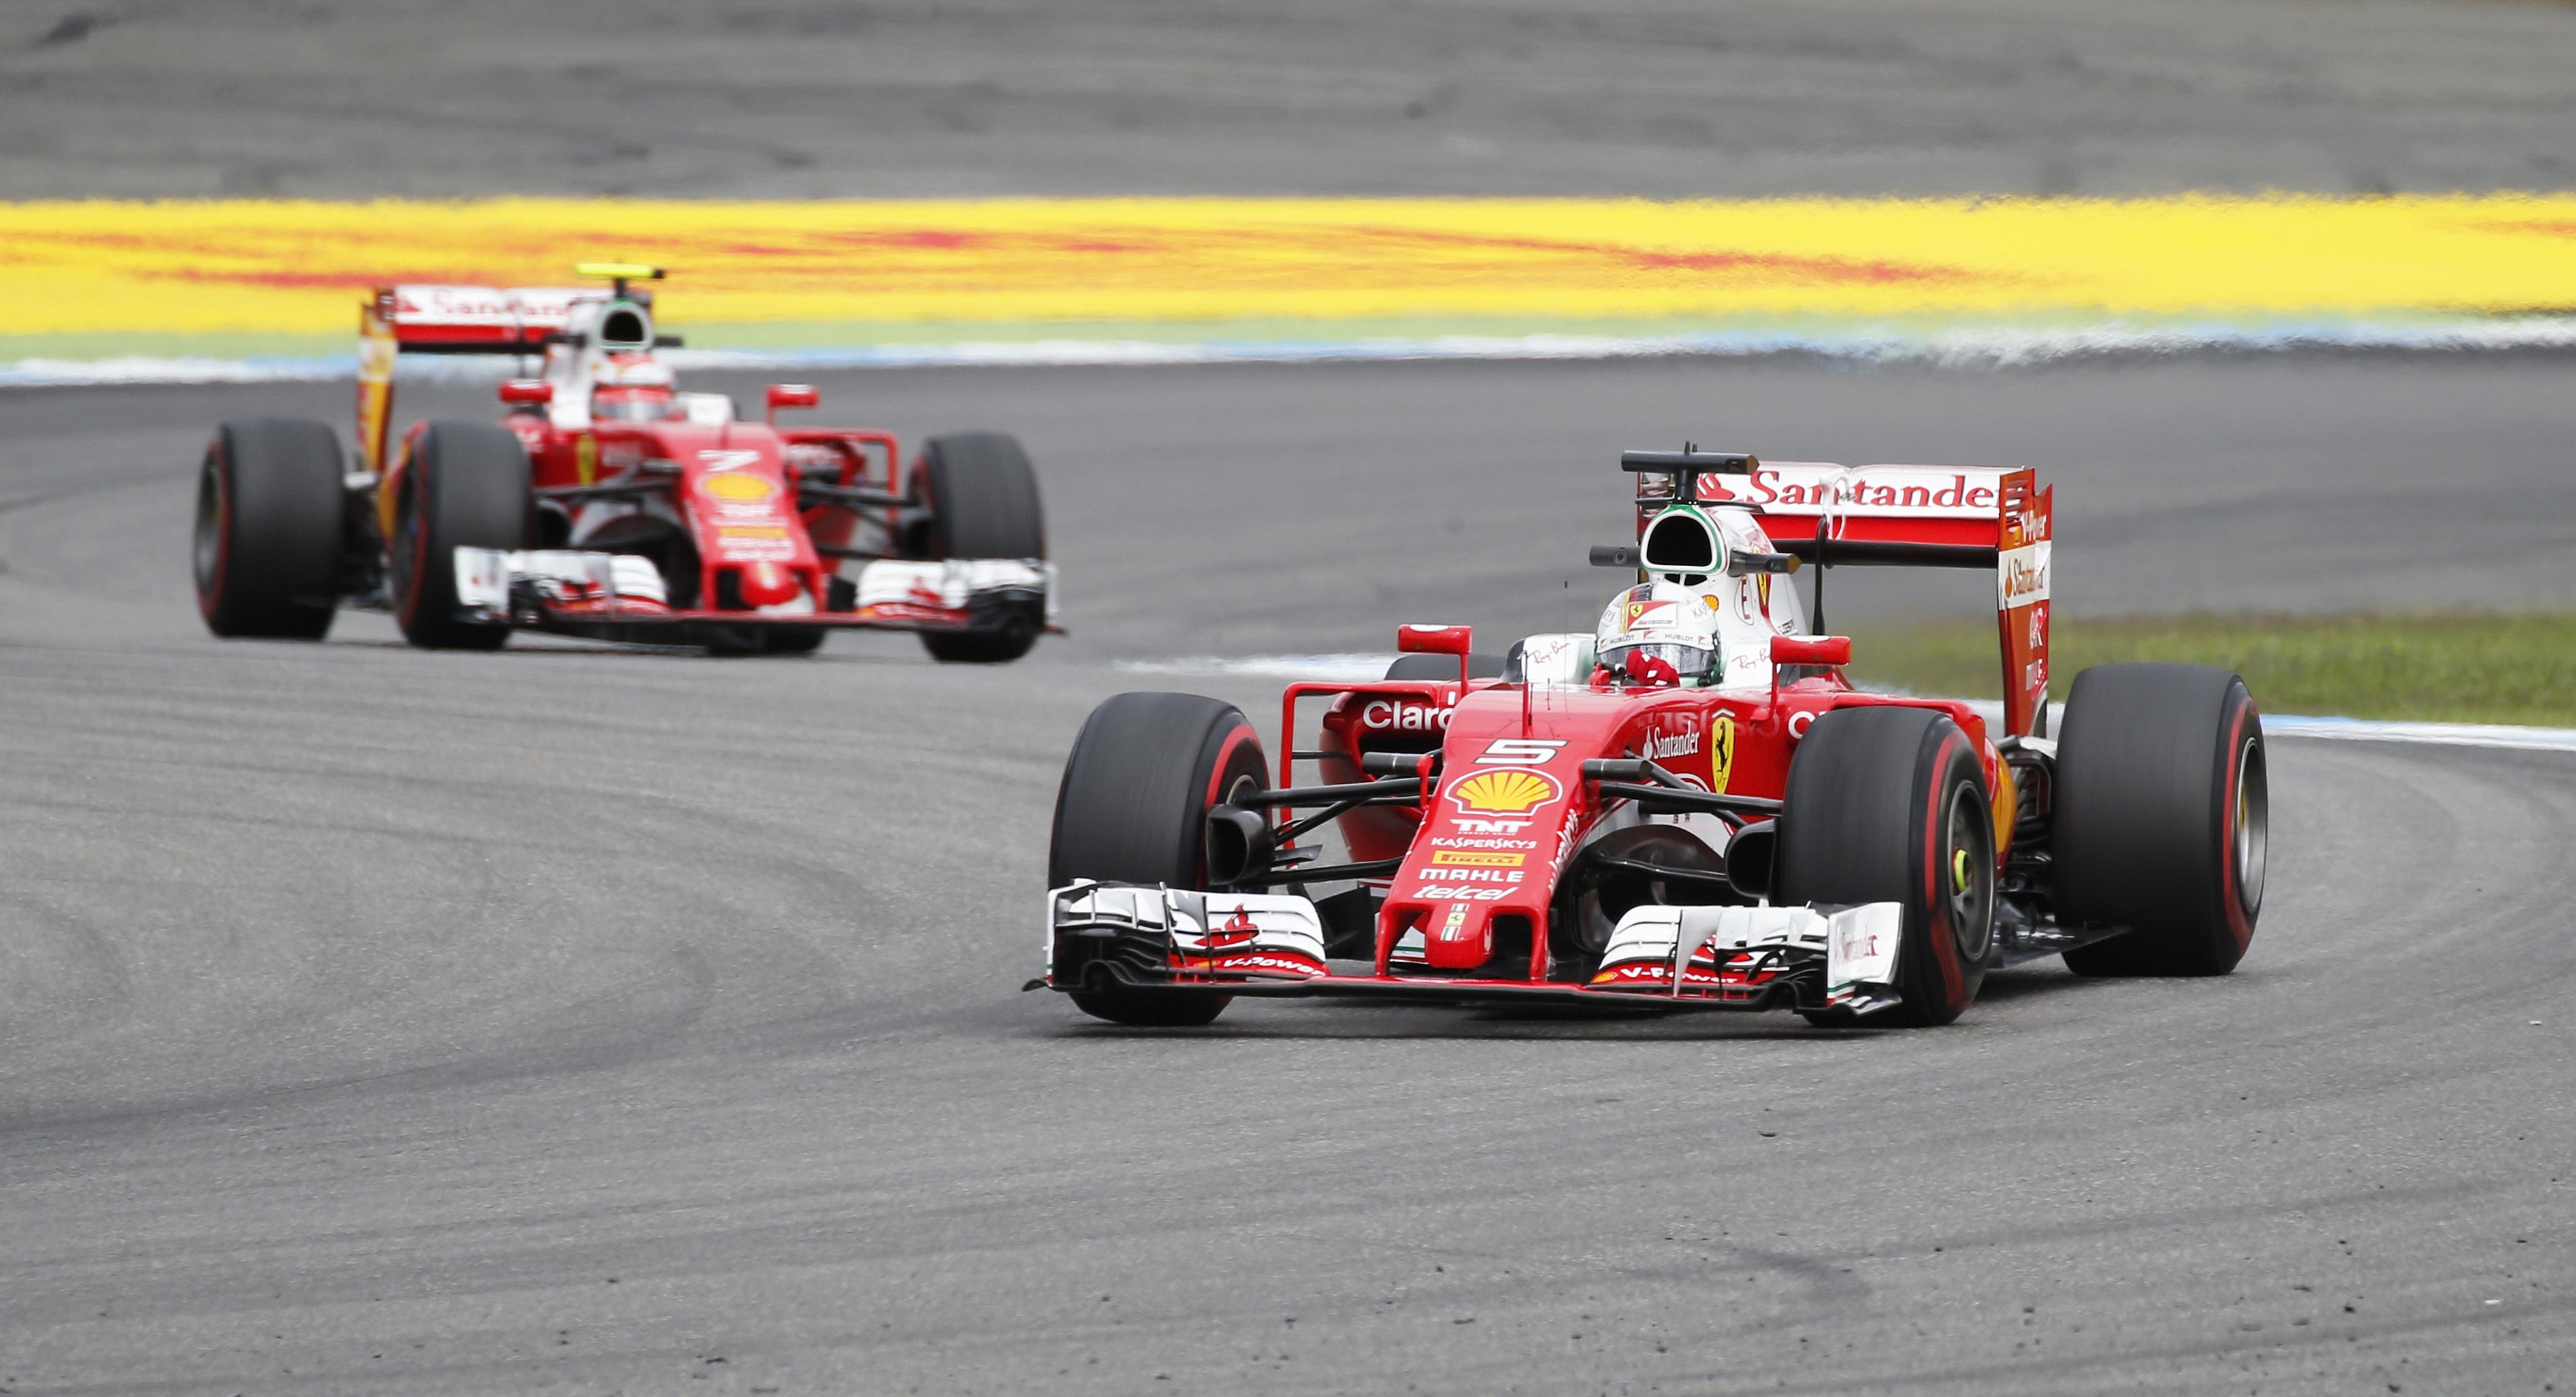 Vettel verpasst ersten Sieg in Sotschi